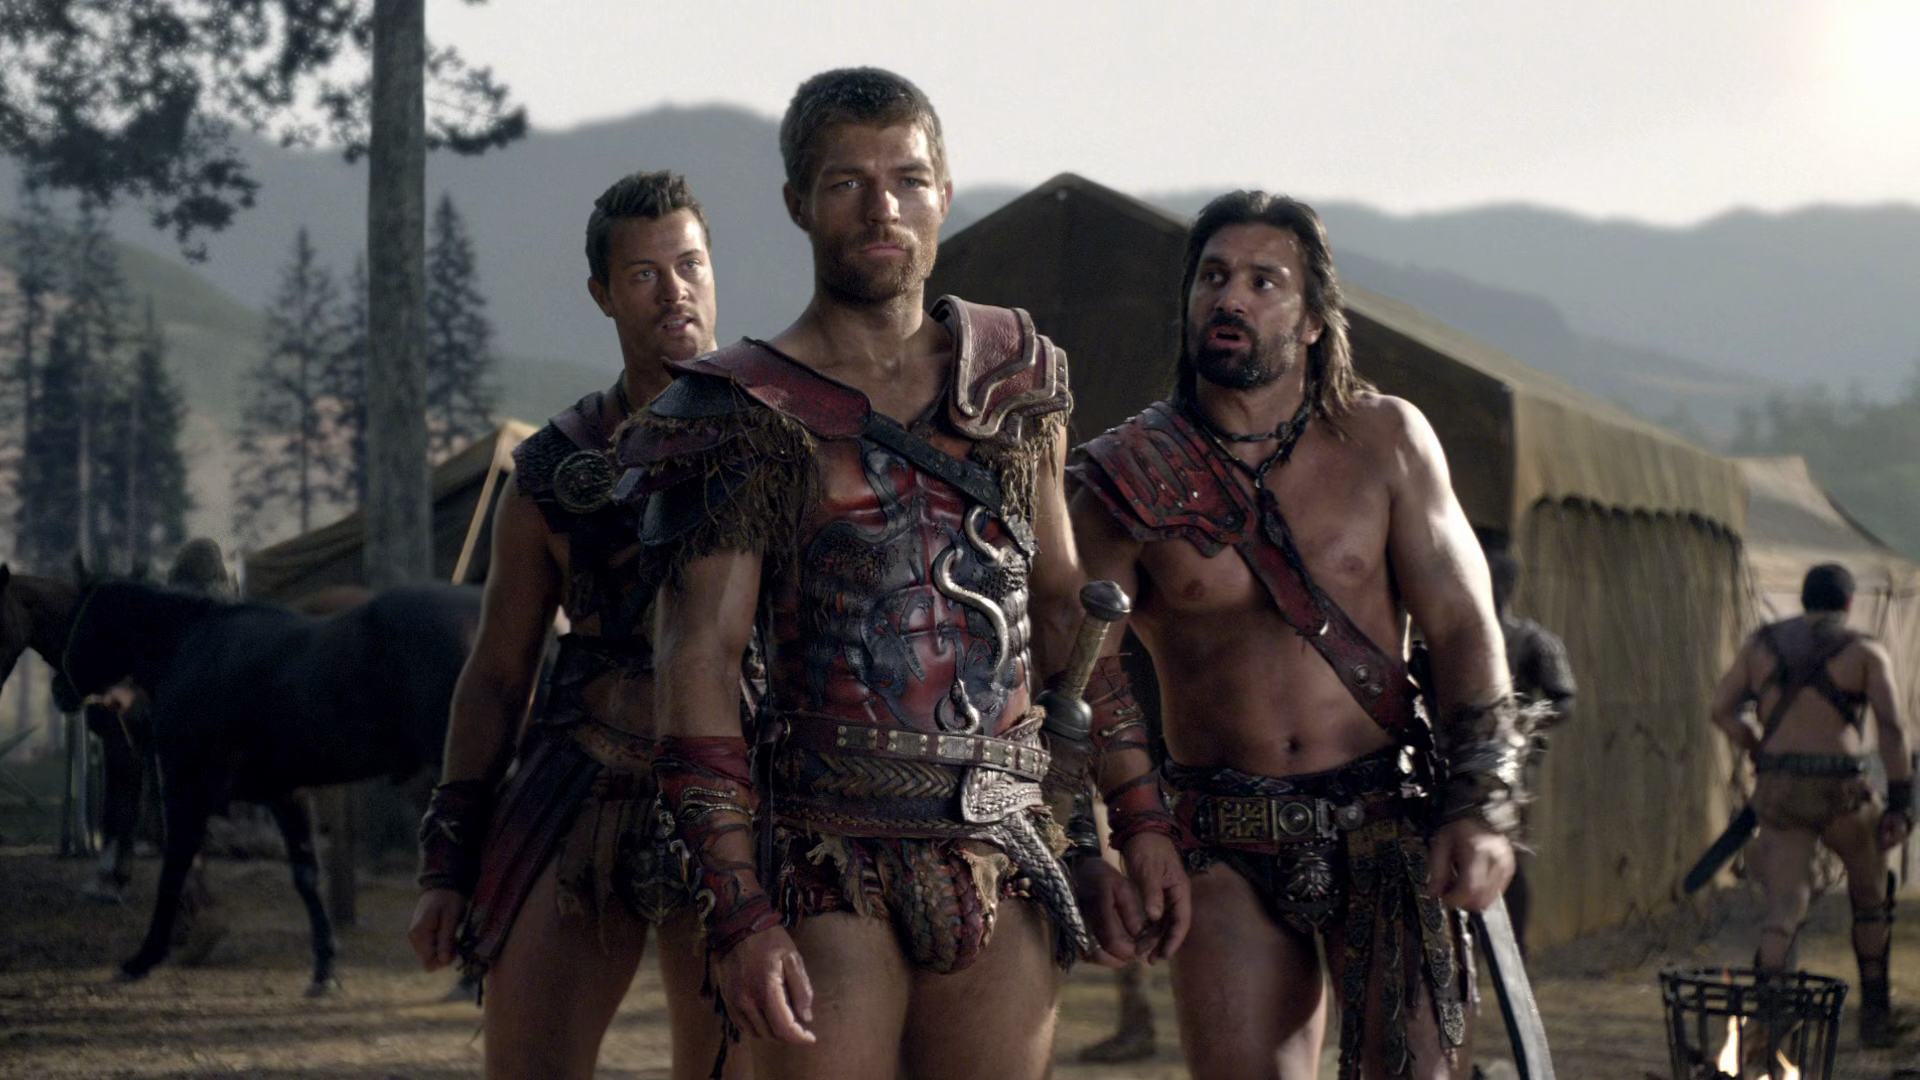 spartacus season 1 episodes download